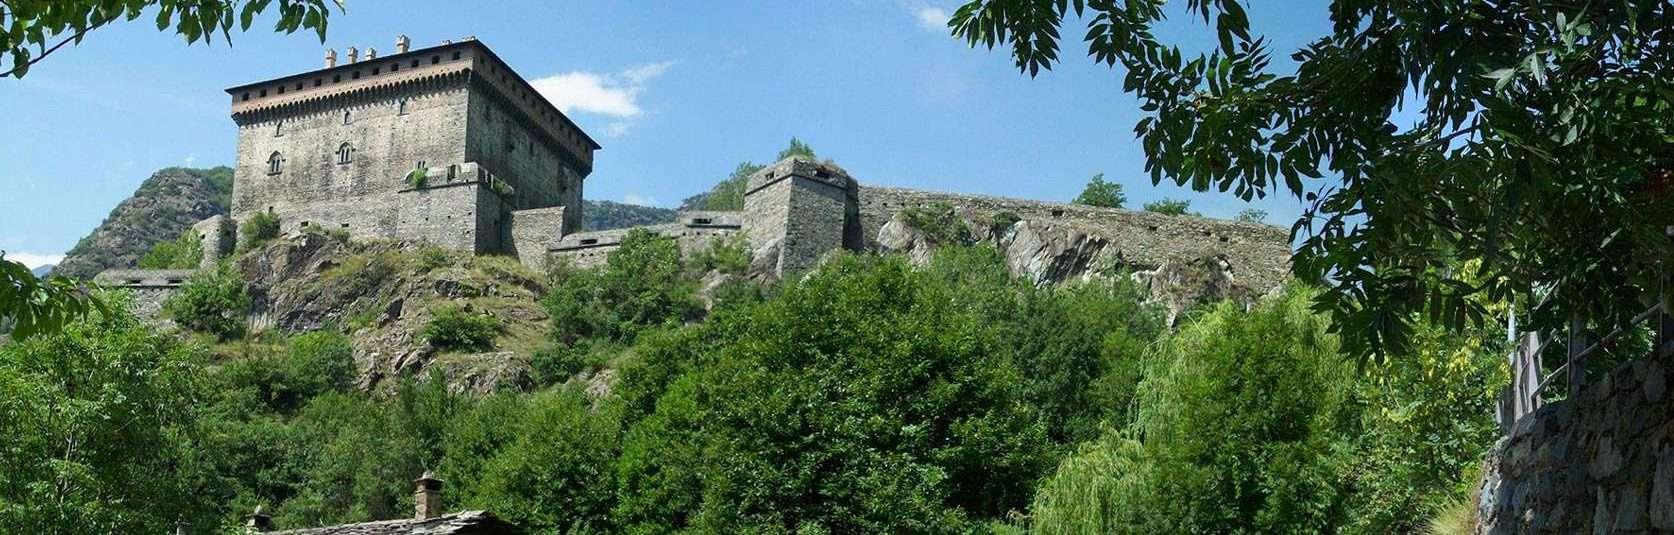 Verrès: Il castello